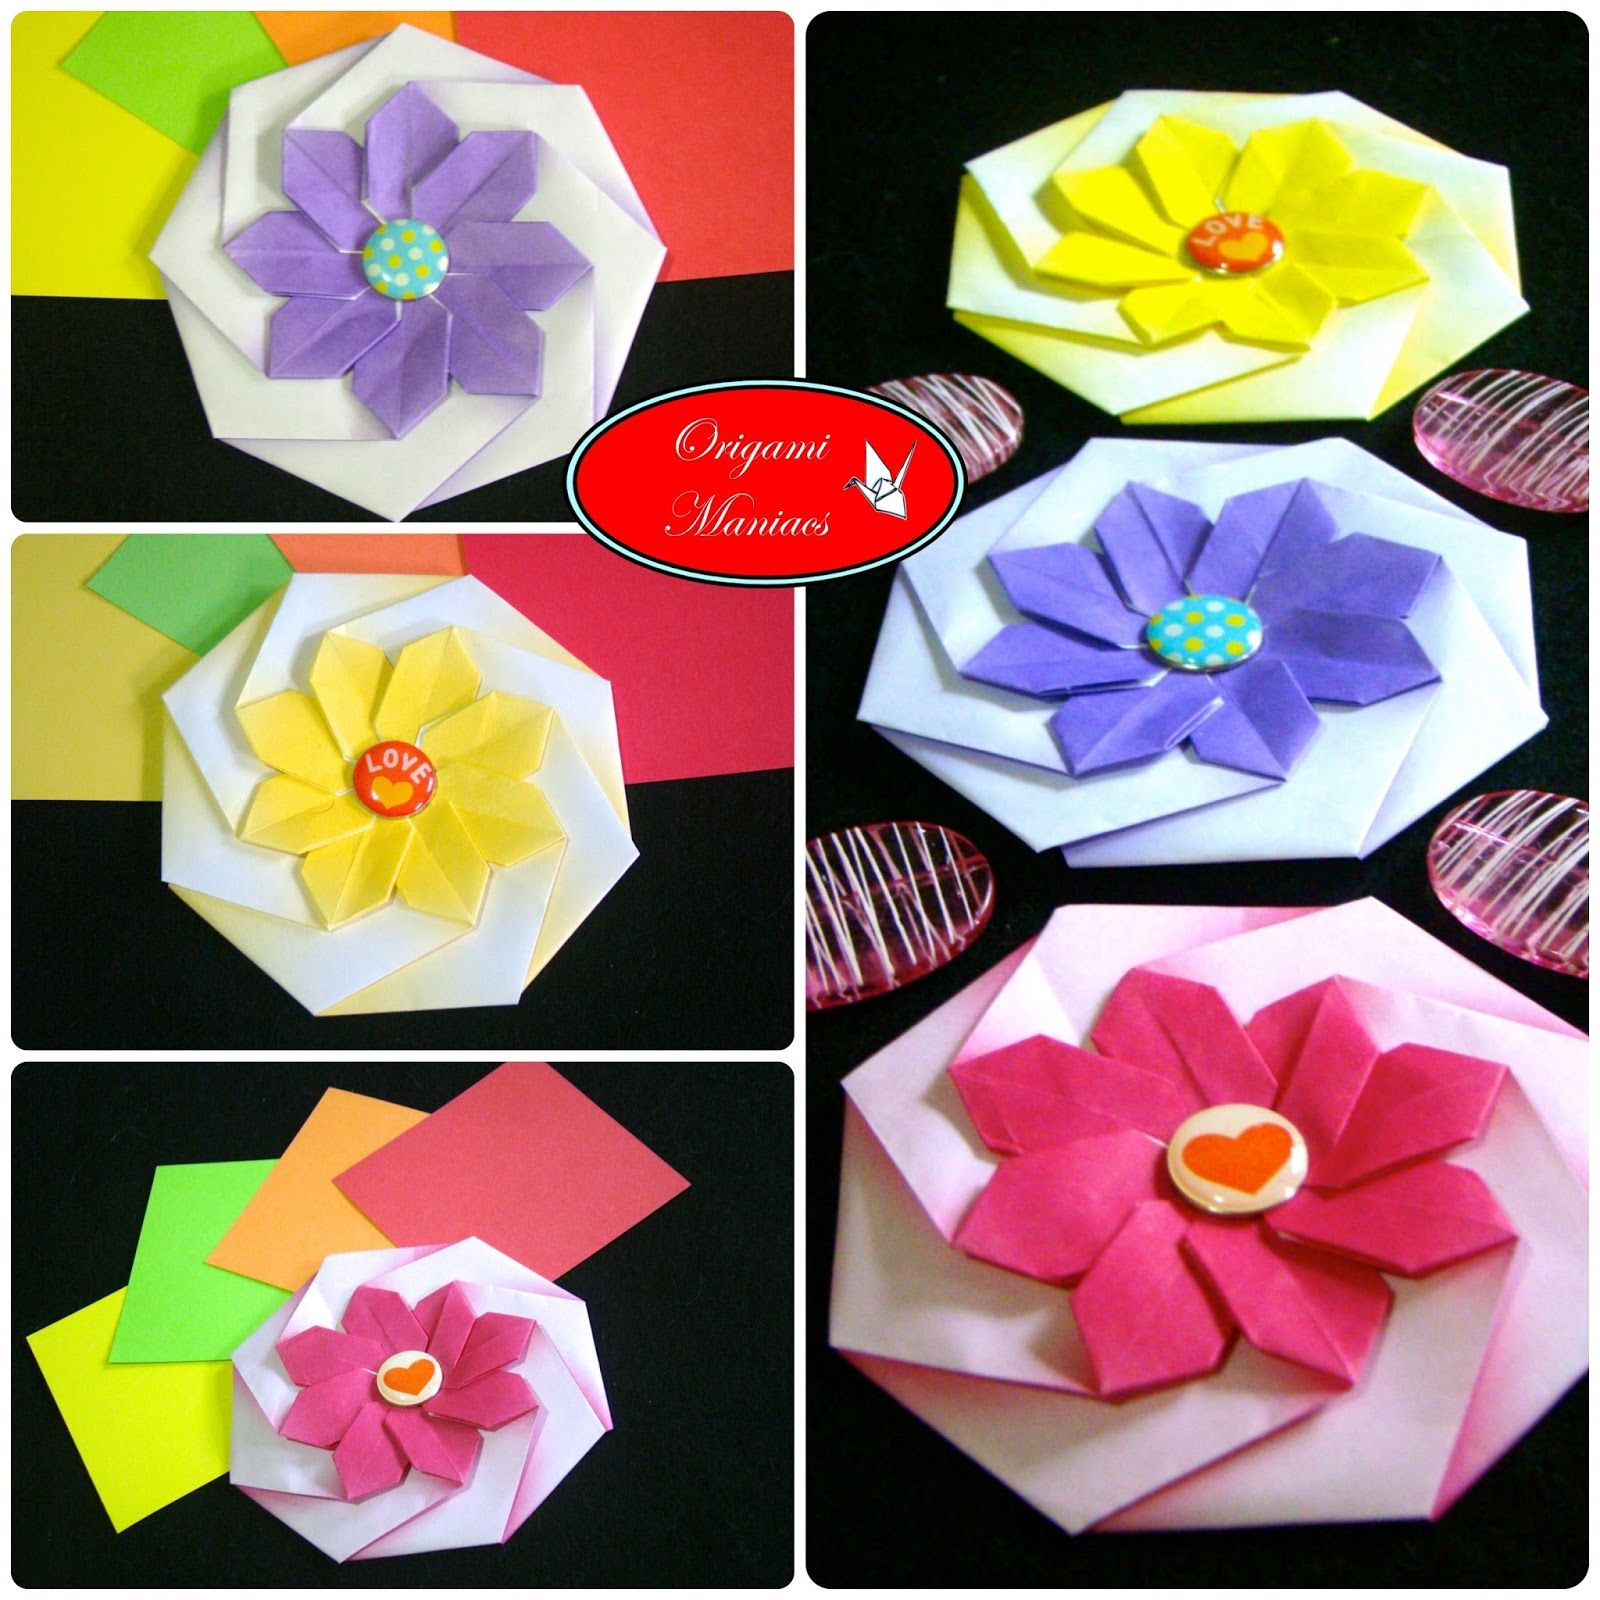 Origami Maniacs Octagonal Flower Coaster Handmade Flowers Rose Diagram Rosebox